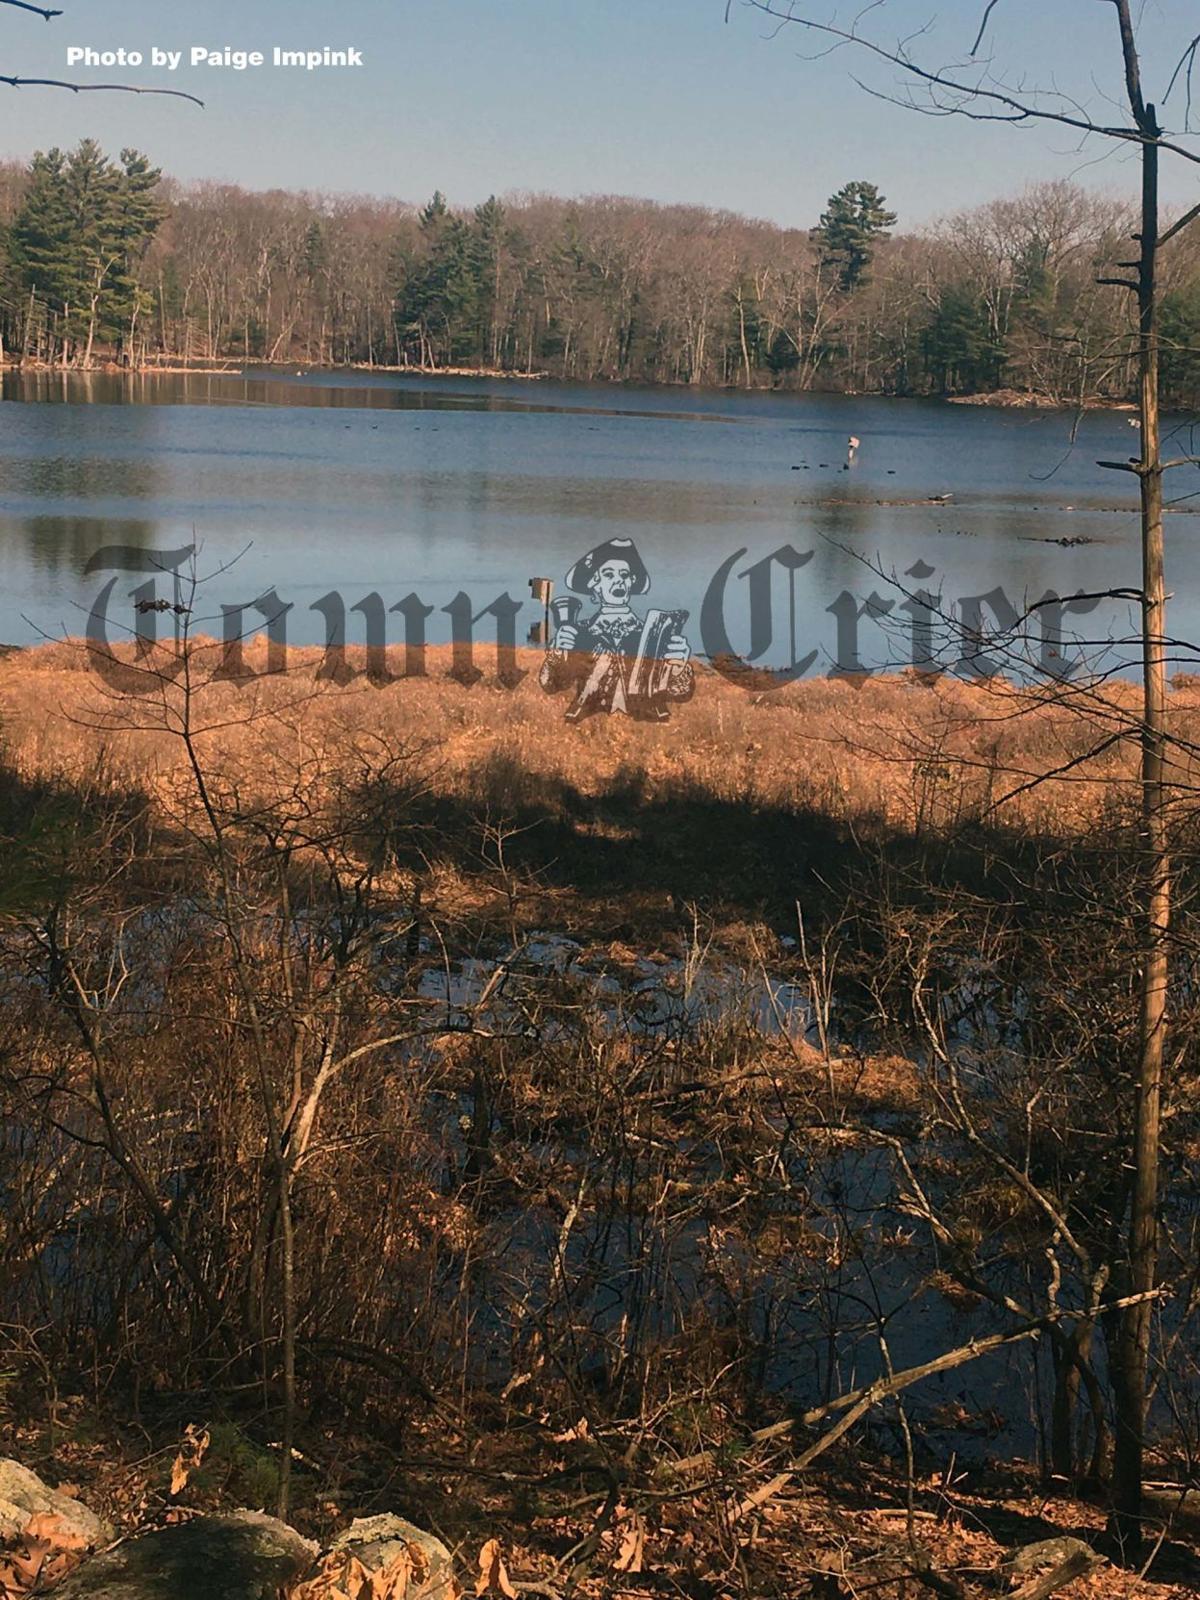 Mink Pond  in Concord's Estabrook Woods